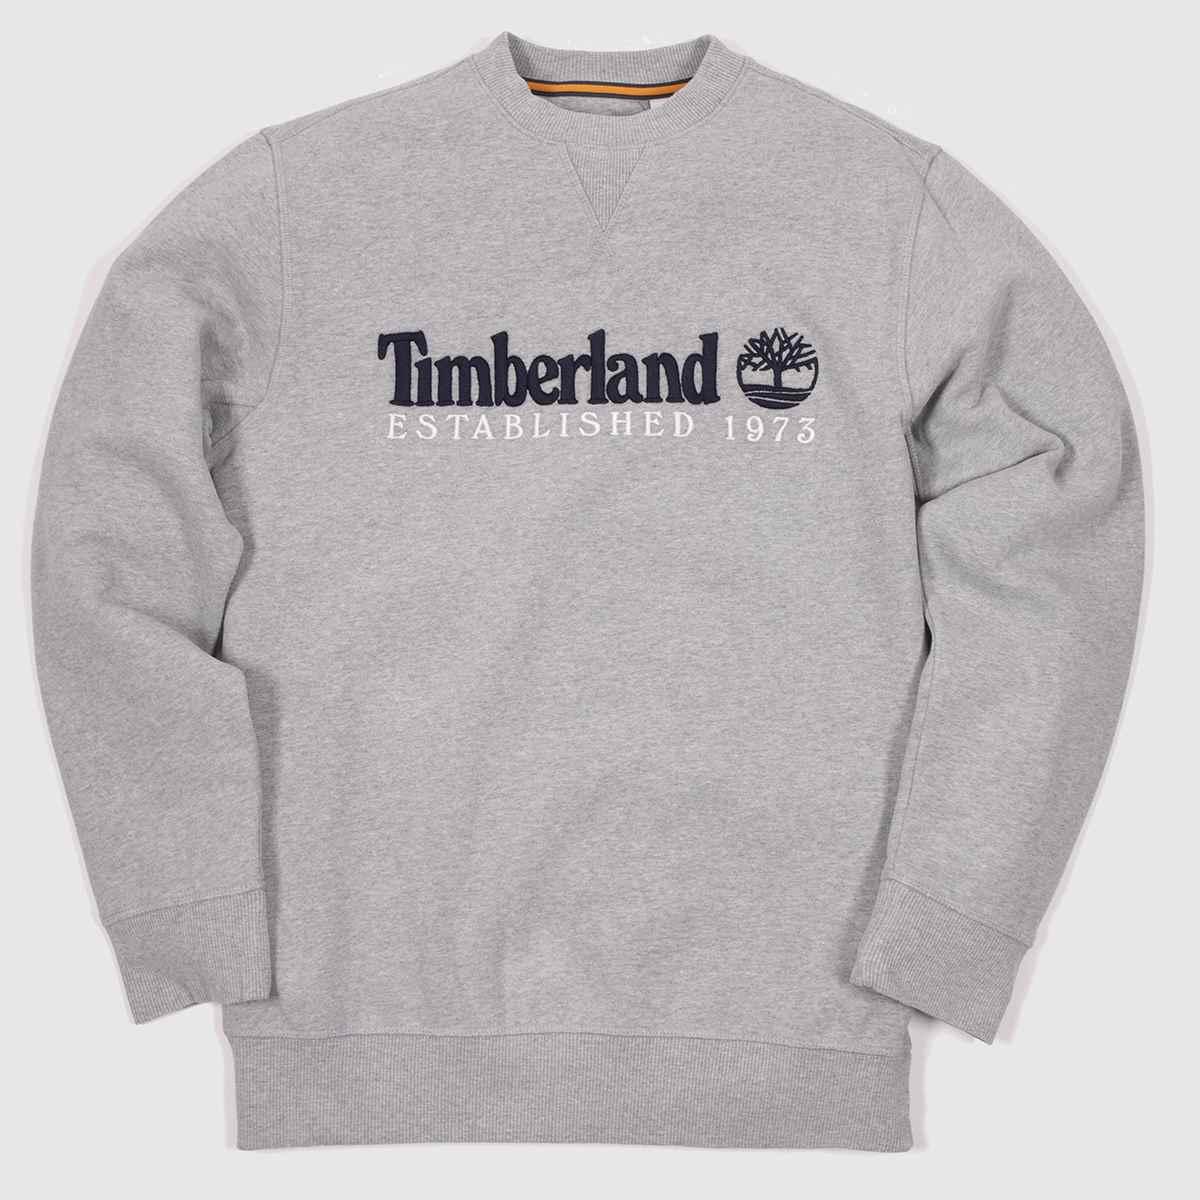 Timberland Grey Heritage Crew Neck Sweat